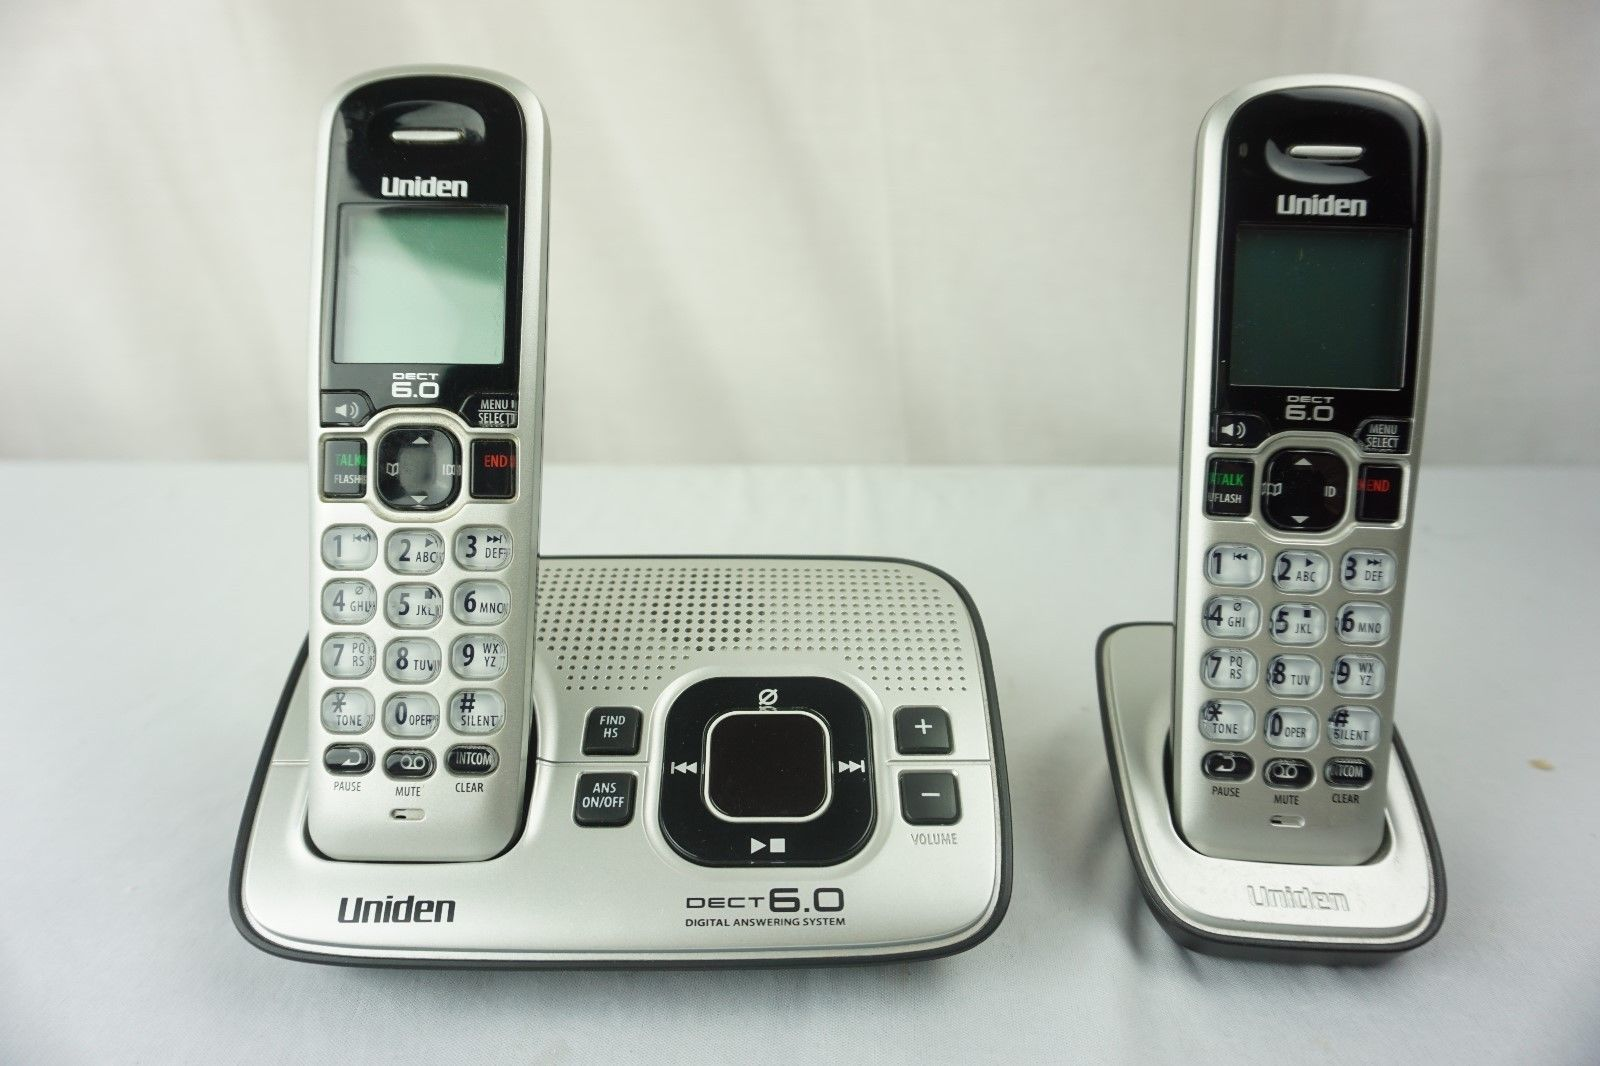 Uniden D1680-3 DECT 6.0 Cordless Phone Answering System 3 Handsets Expandable image 2